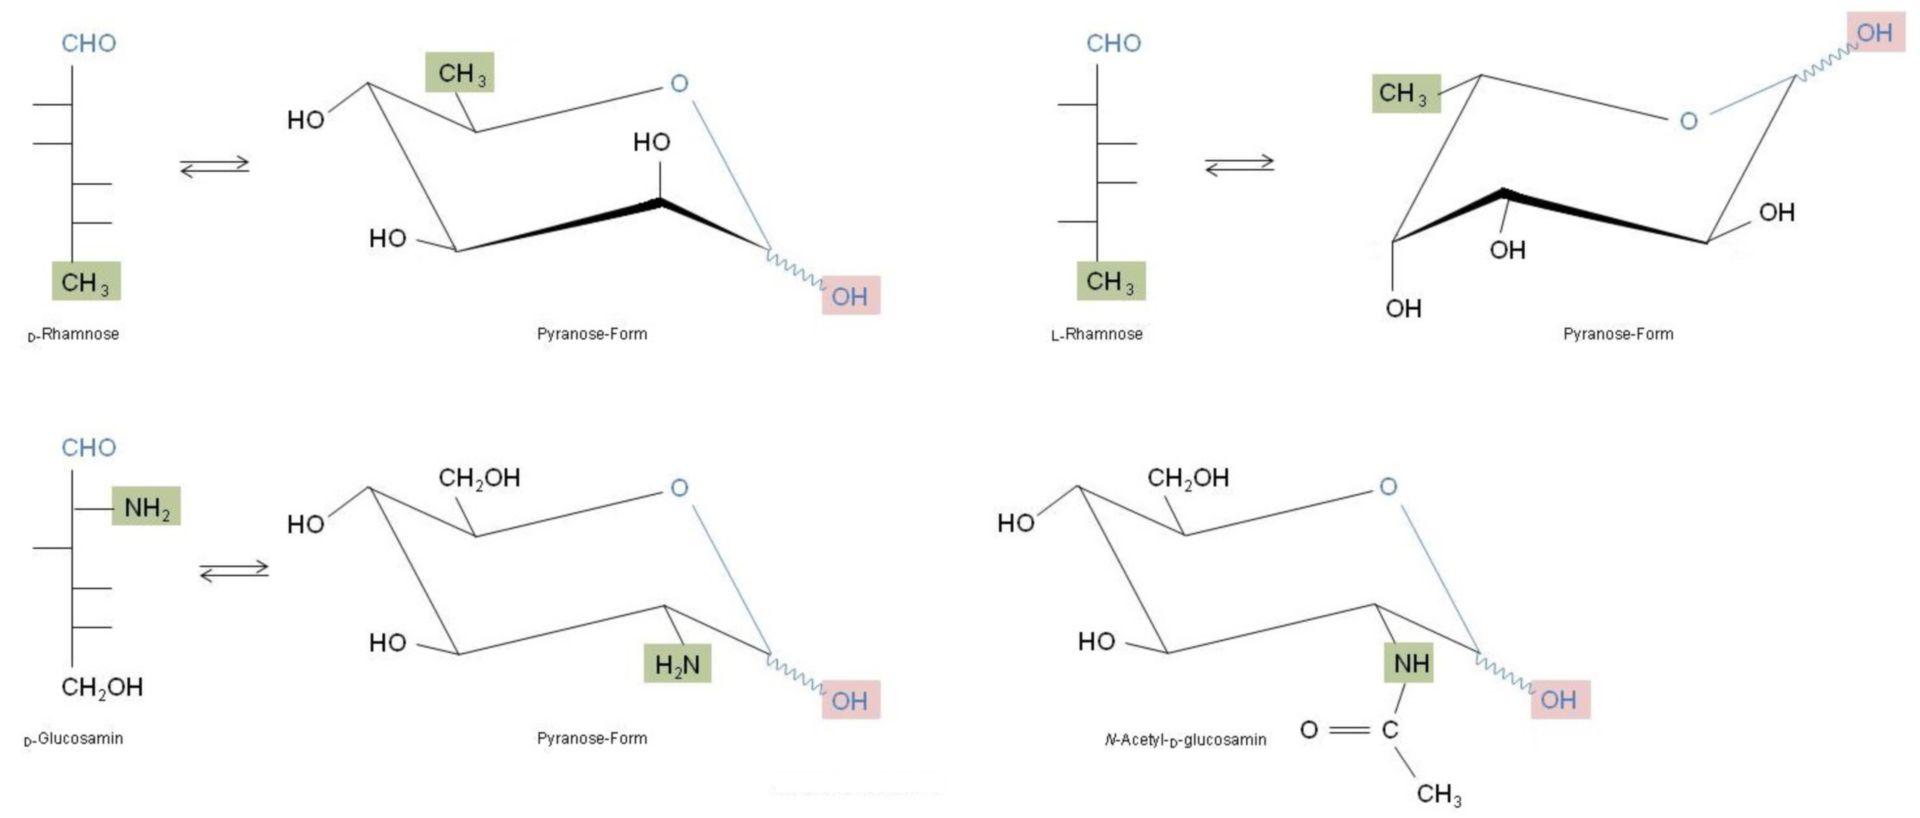 Wichtige Monosaccharide